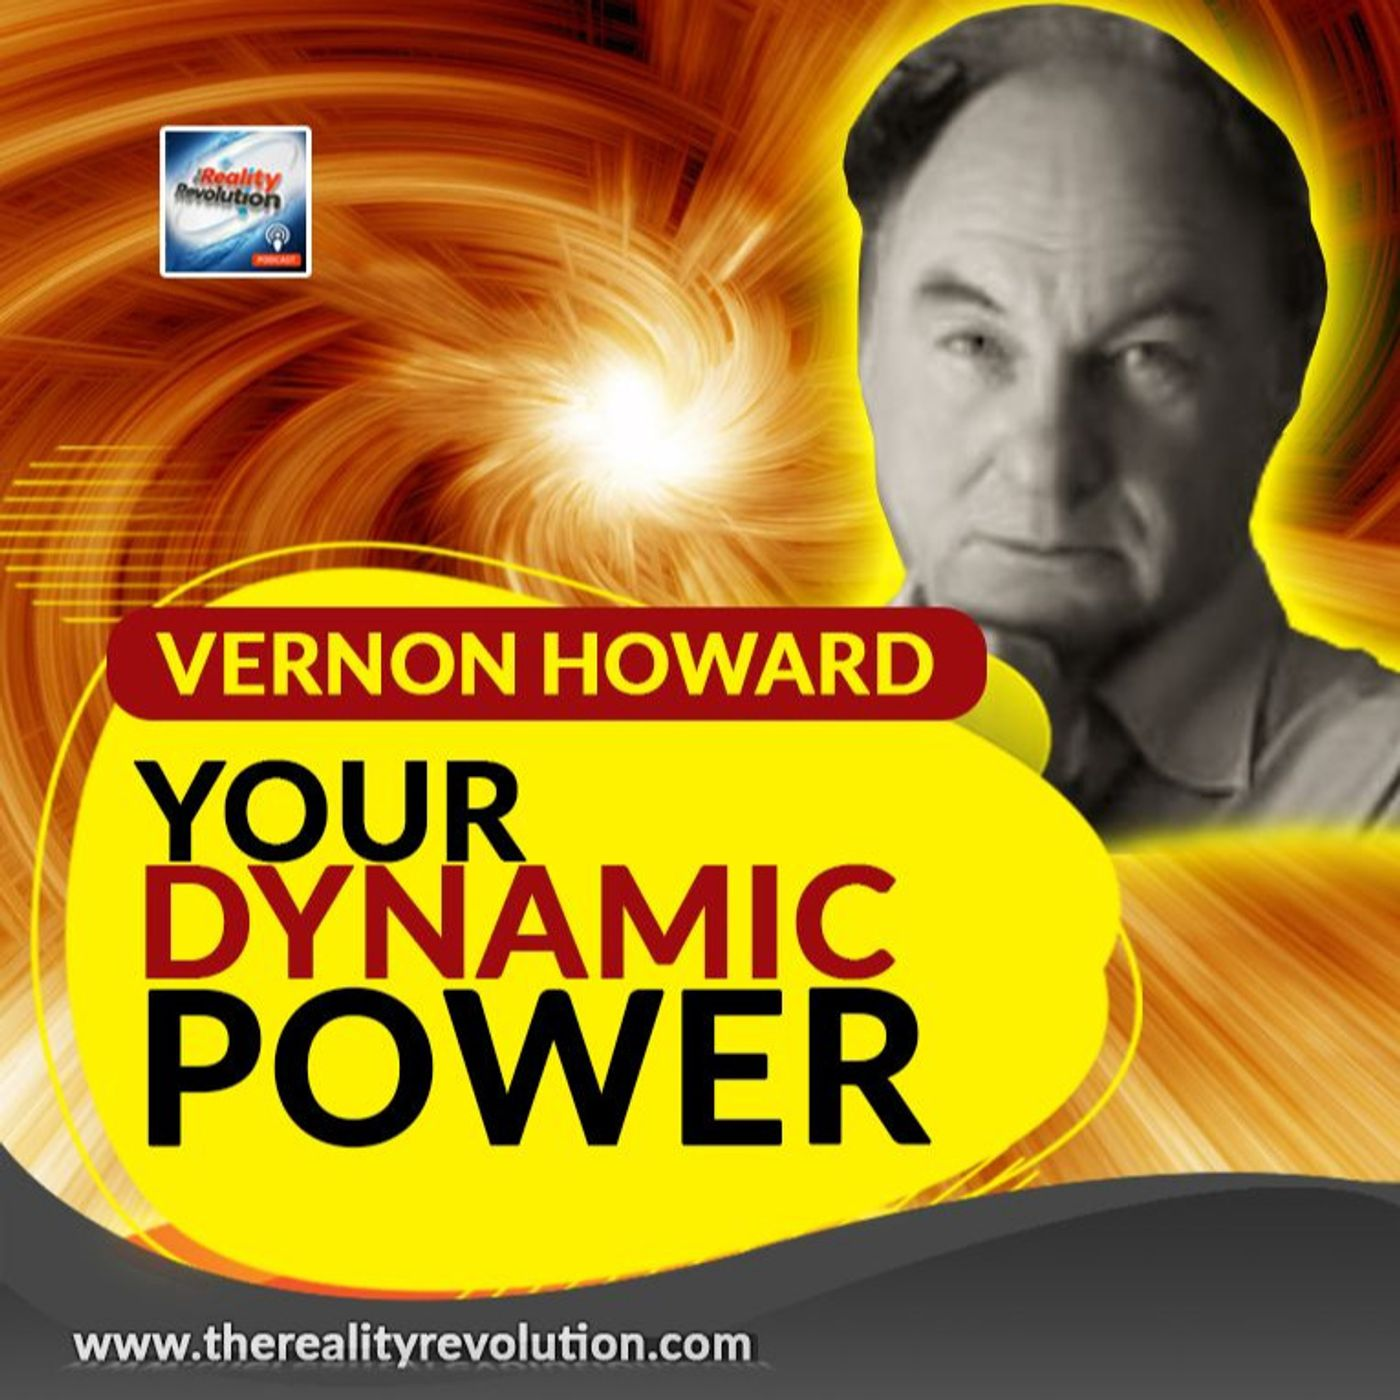 Vernon Howard Your Dynamic Power